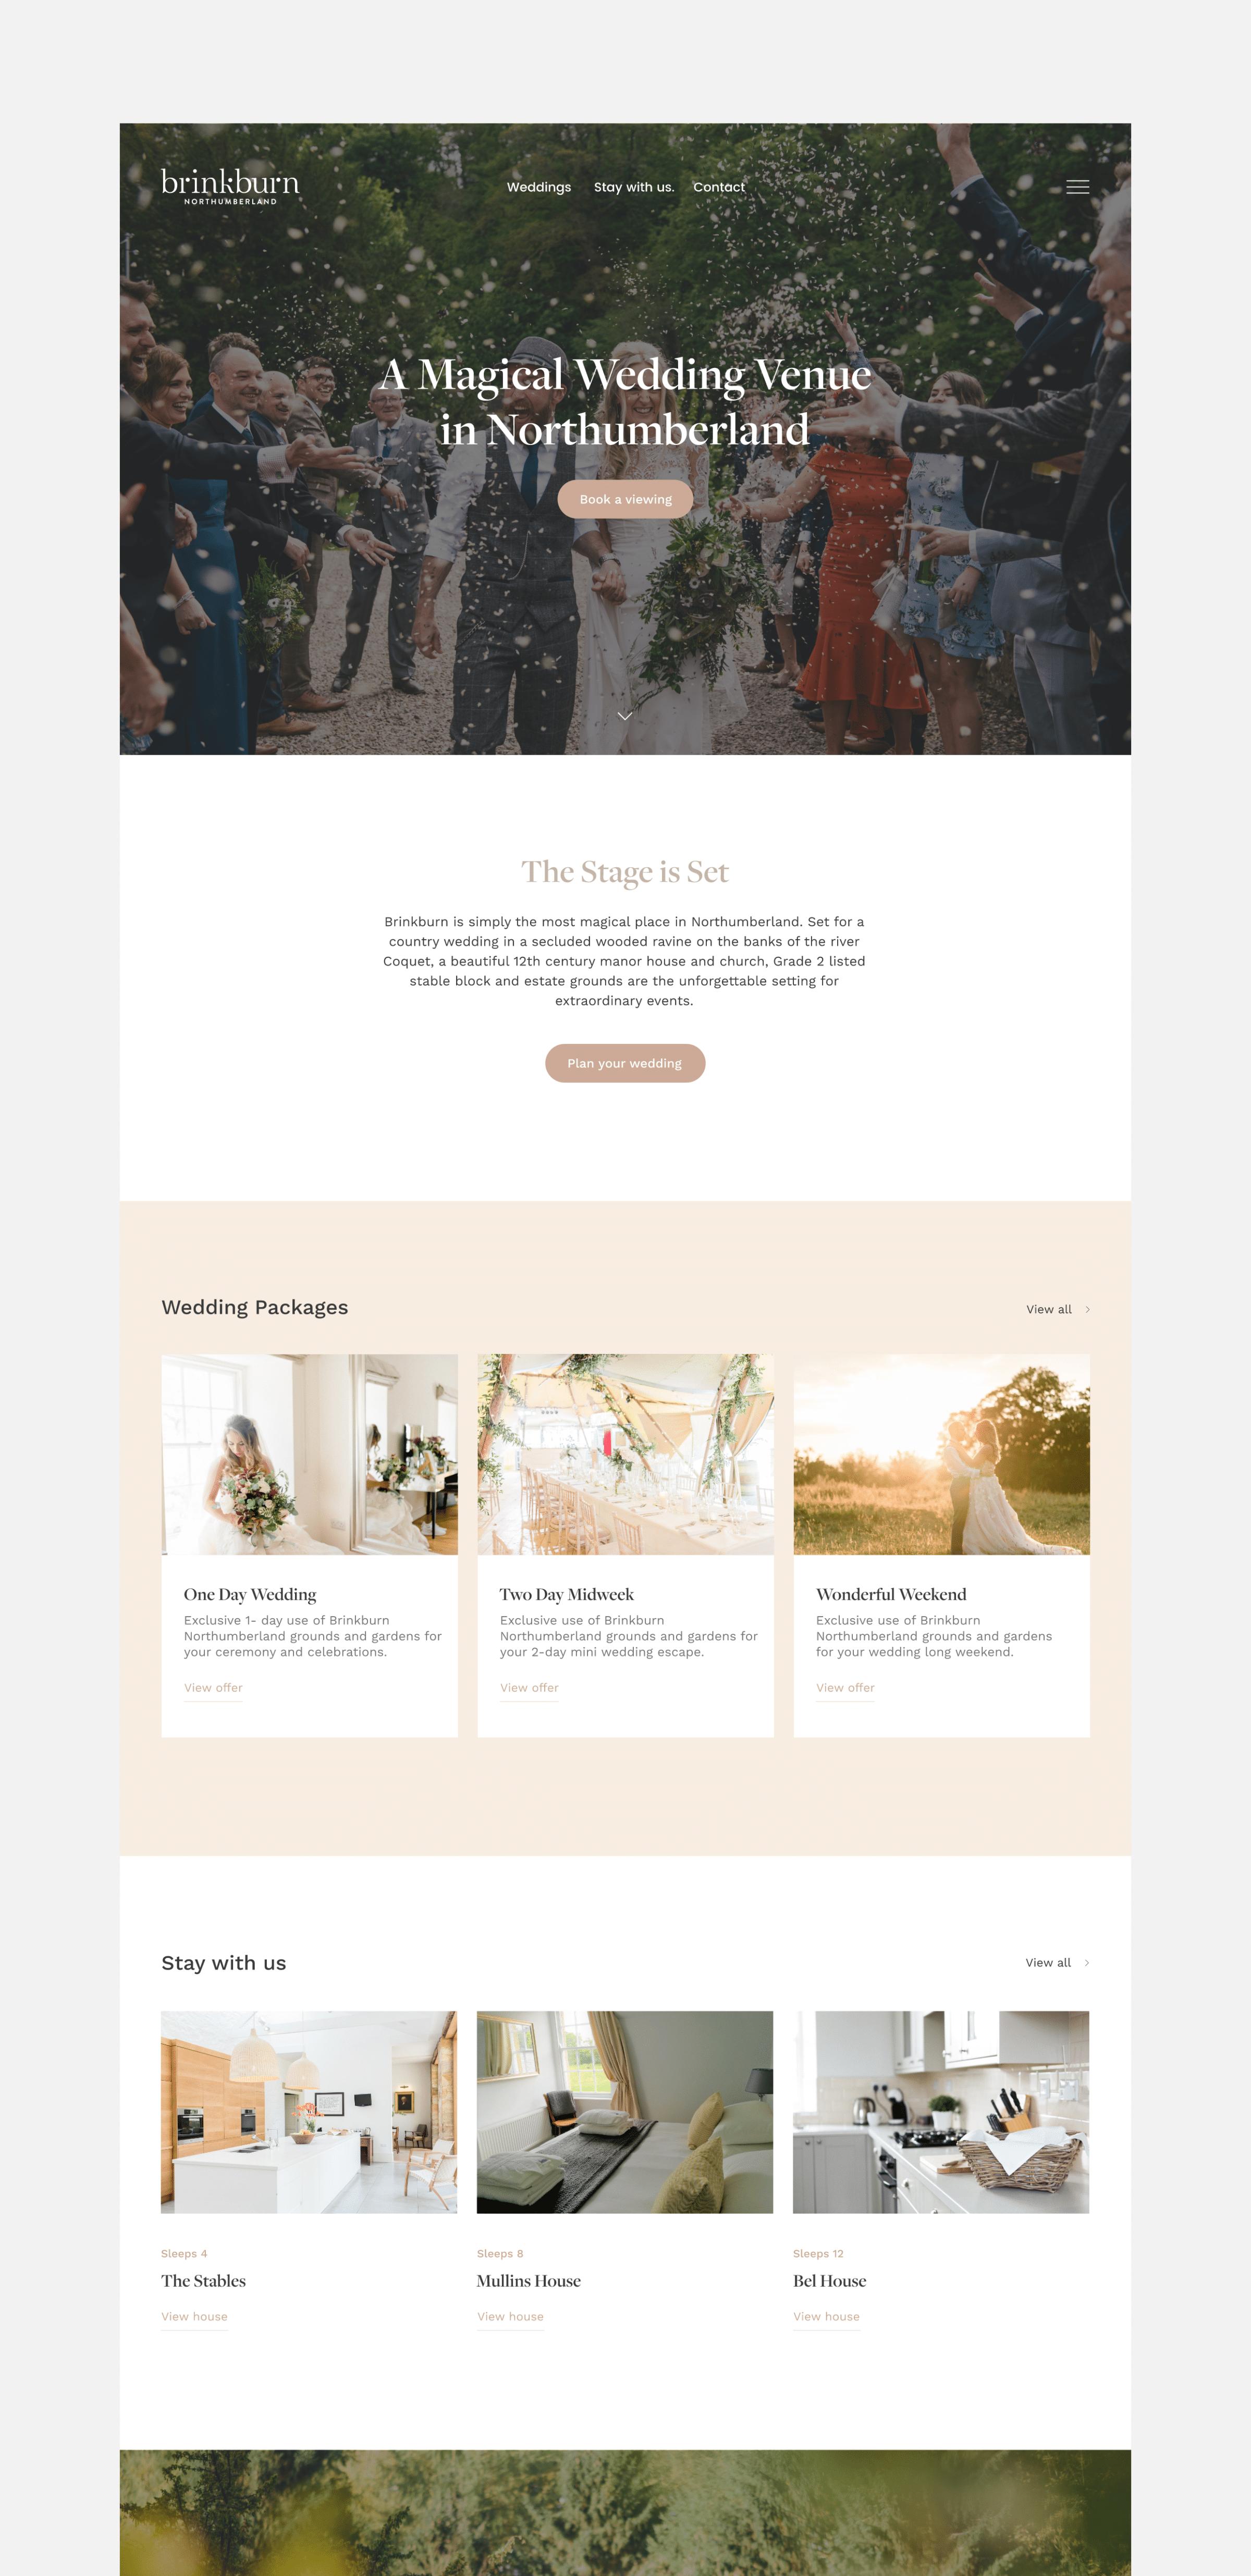 Brinkburn website by TAC